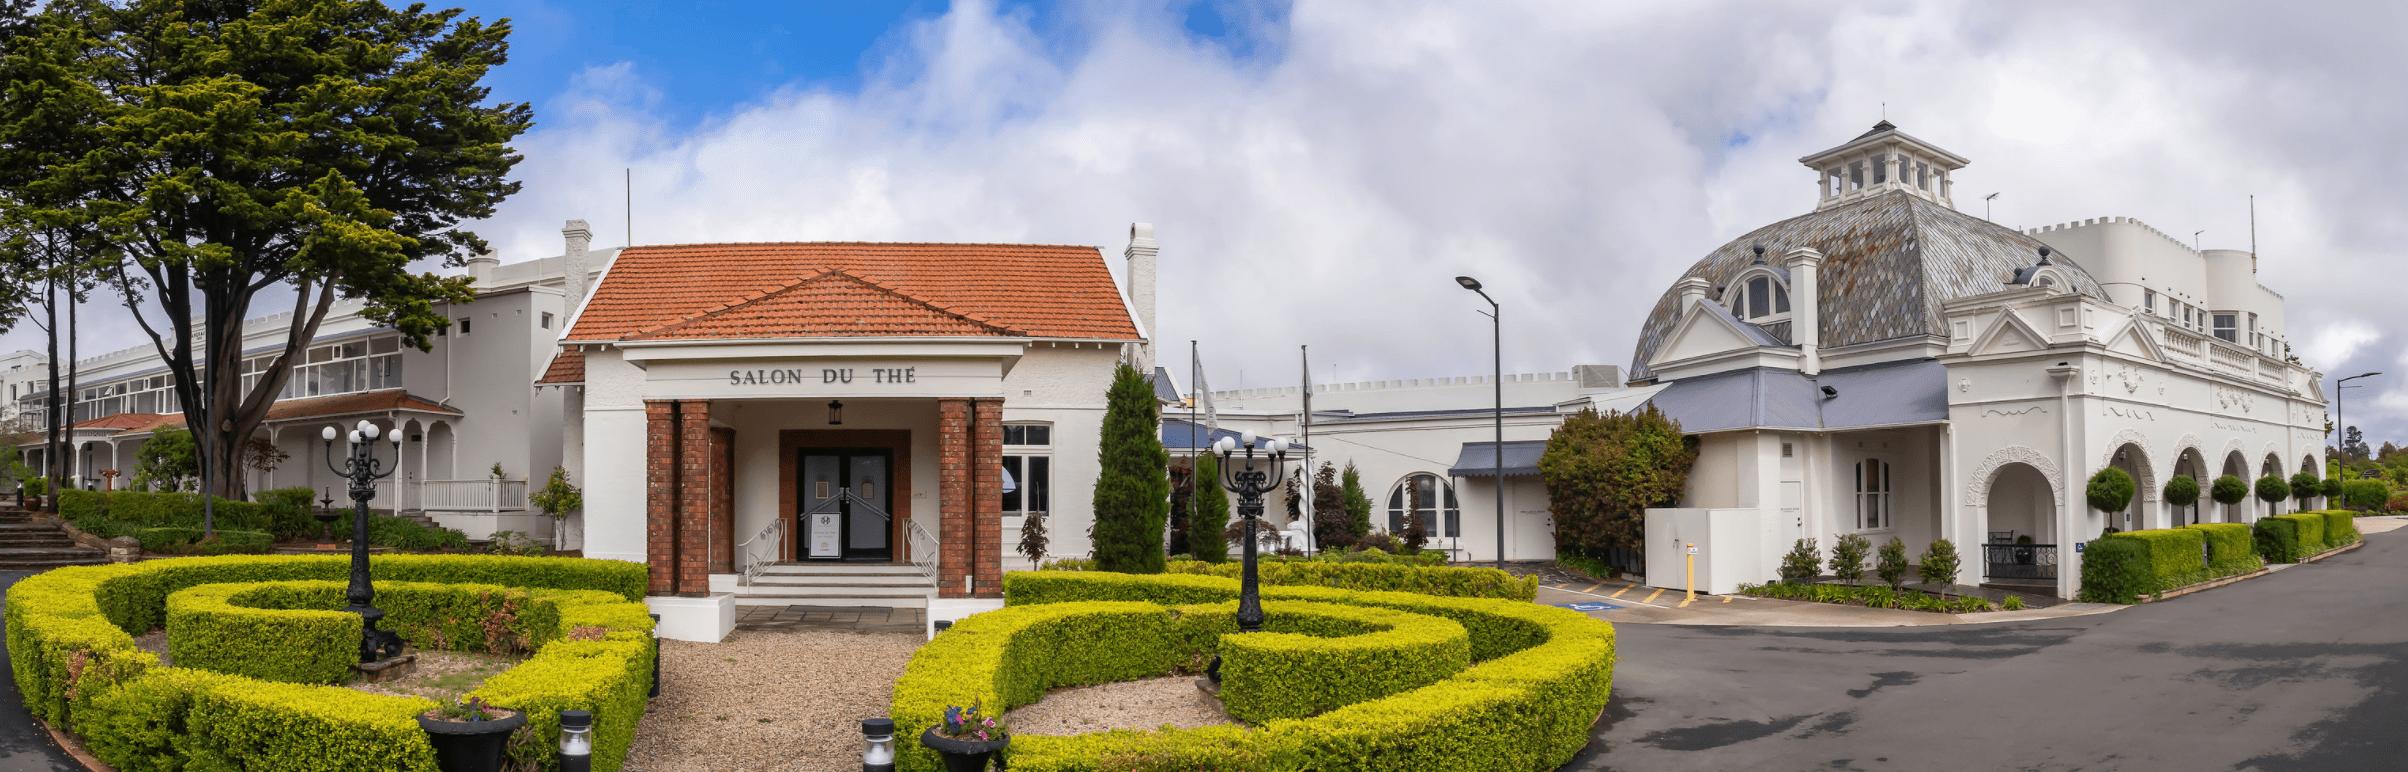 Hydro Majestic Hotel Medlow Bath